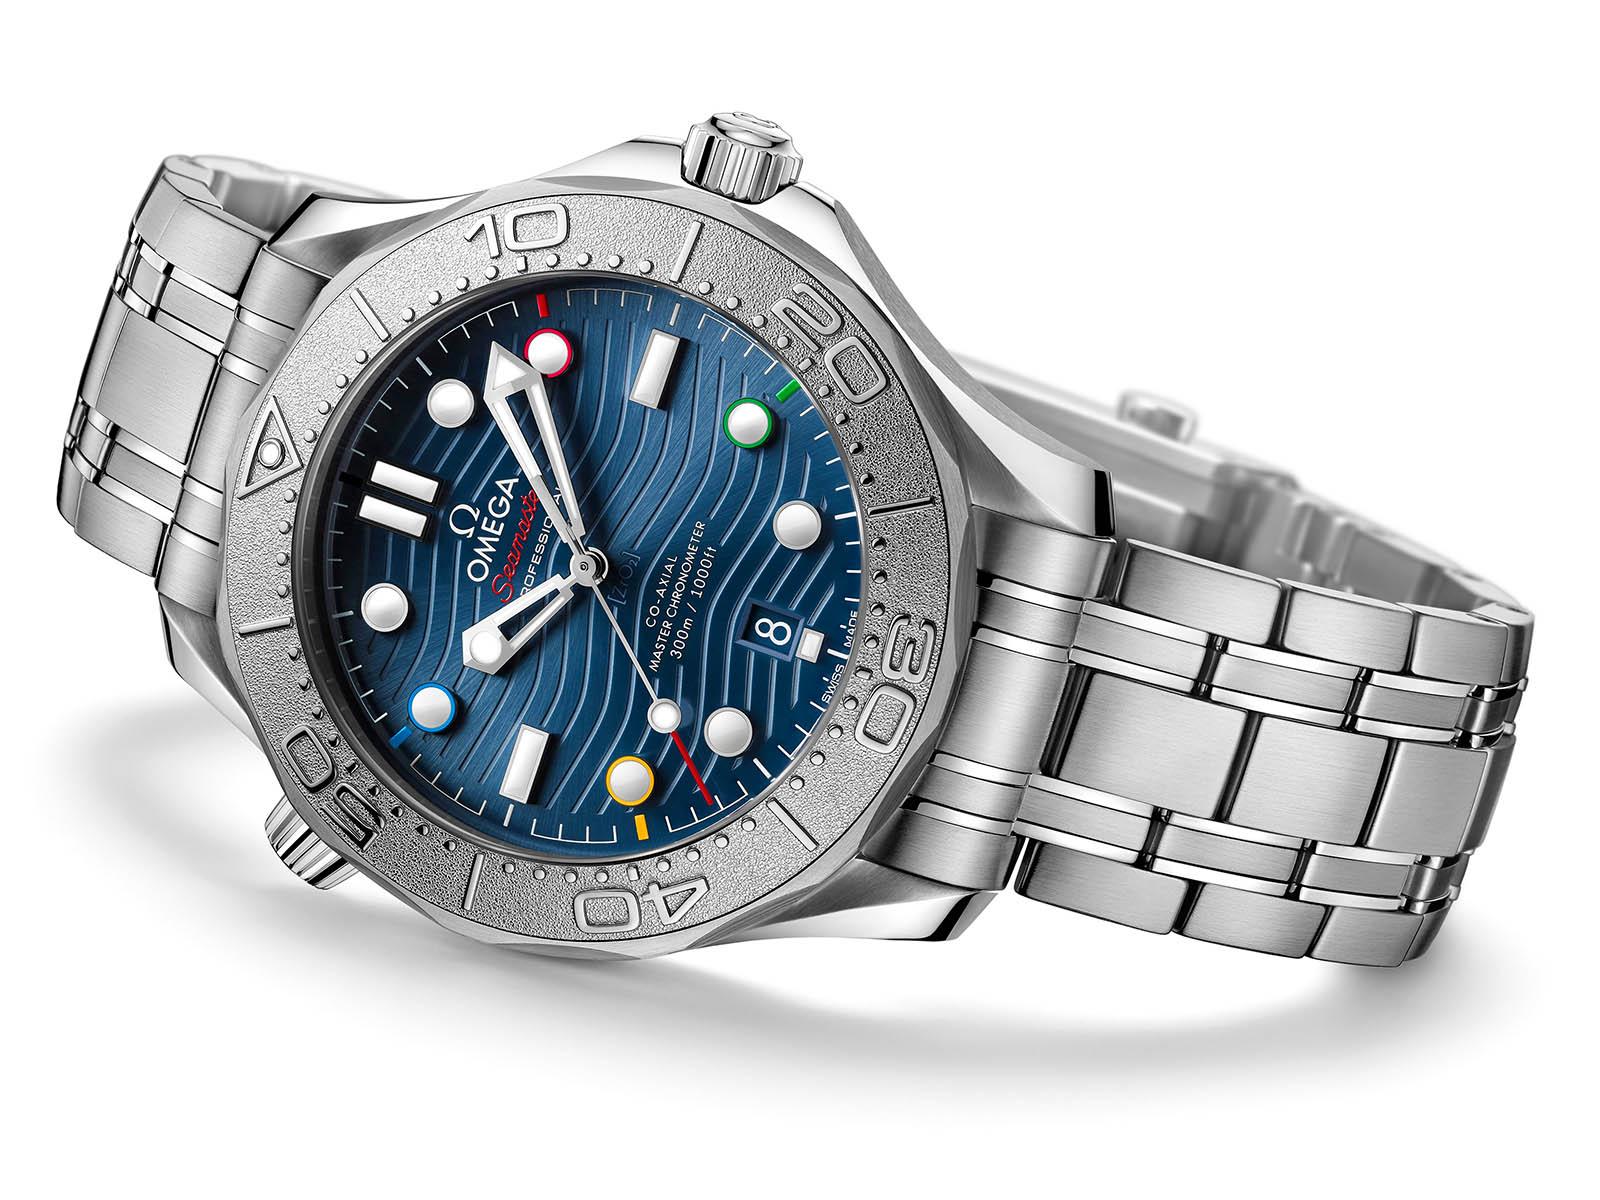 522-30-42-20-03-001-omega-seamaster-diver-300m-beijing-2022-special-edition-6.jpg